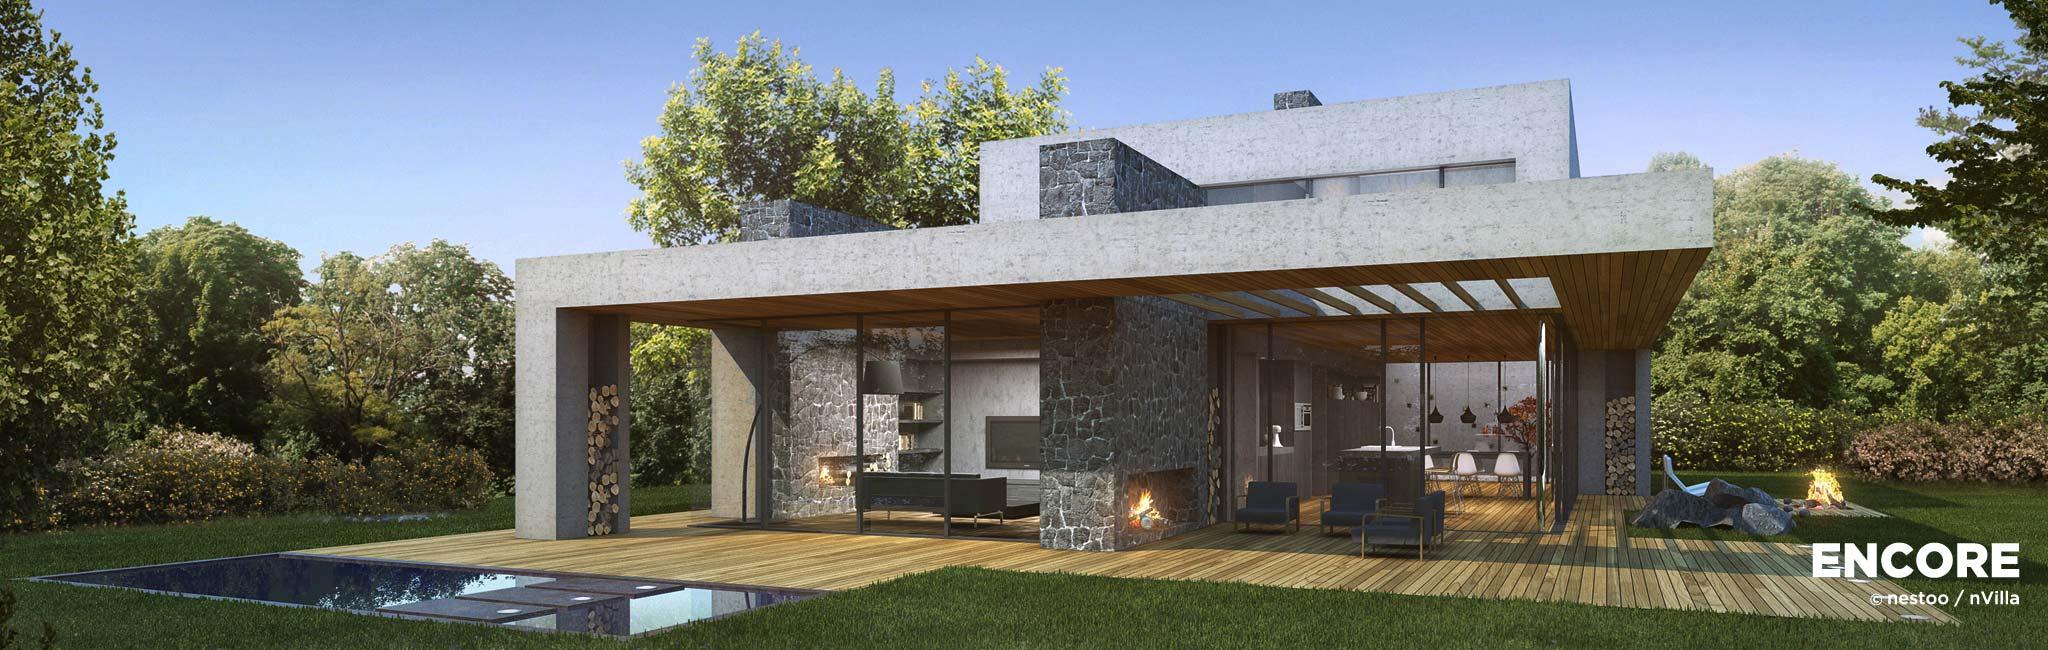 Nvilla encore nestoo for Villa moderne 2016